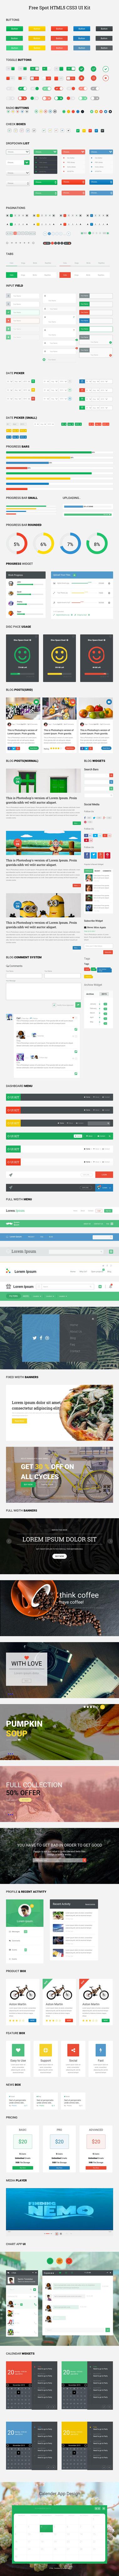 Free Spot HTML5 CSS3 UI Kit